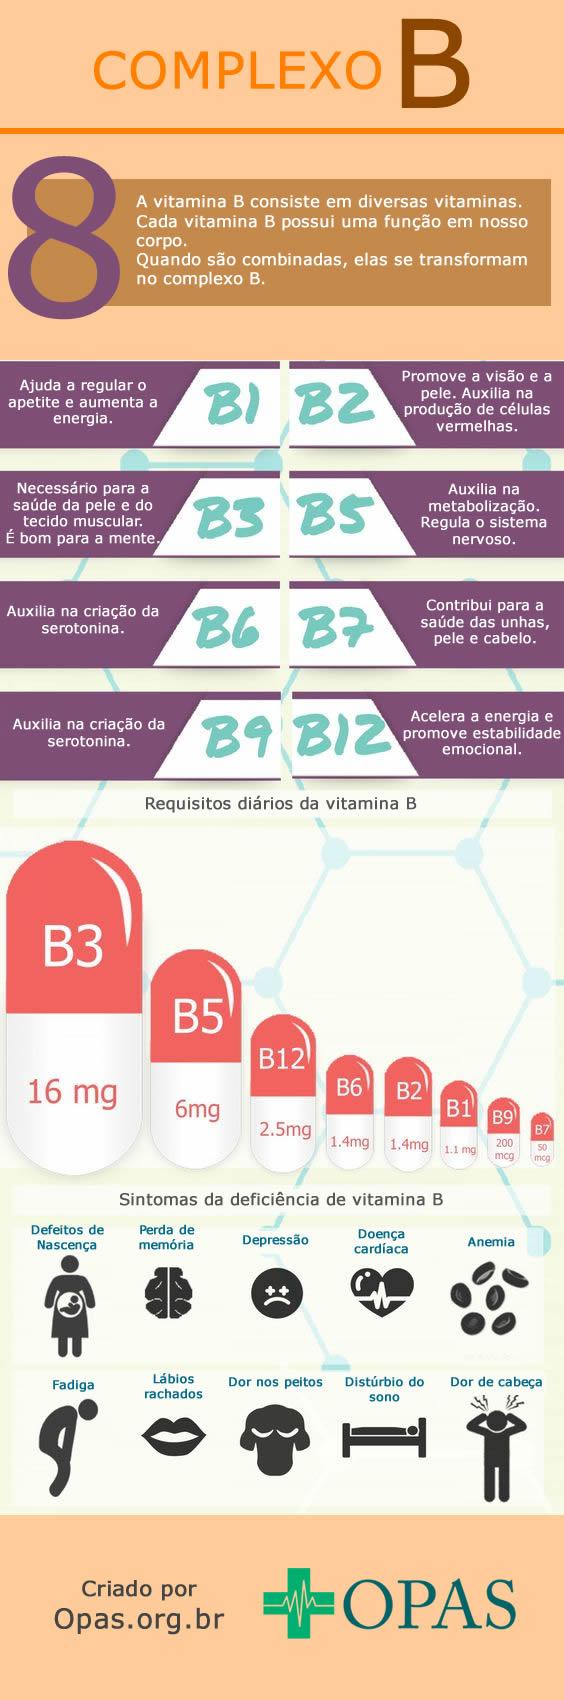 Infográfico das vitaminas do complexo B